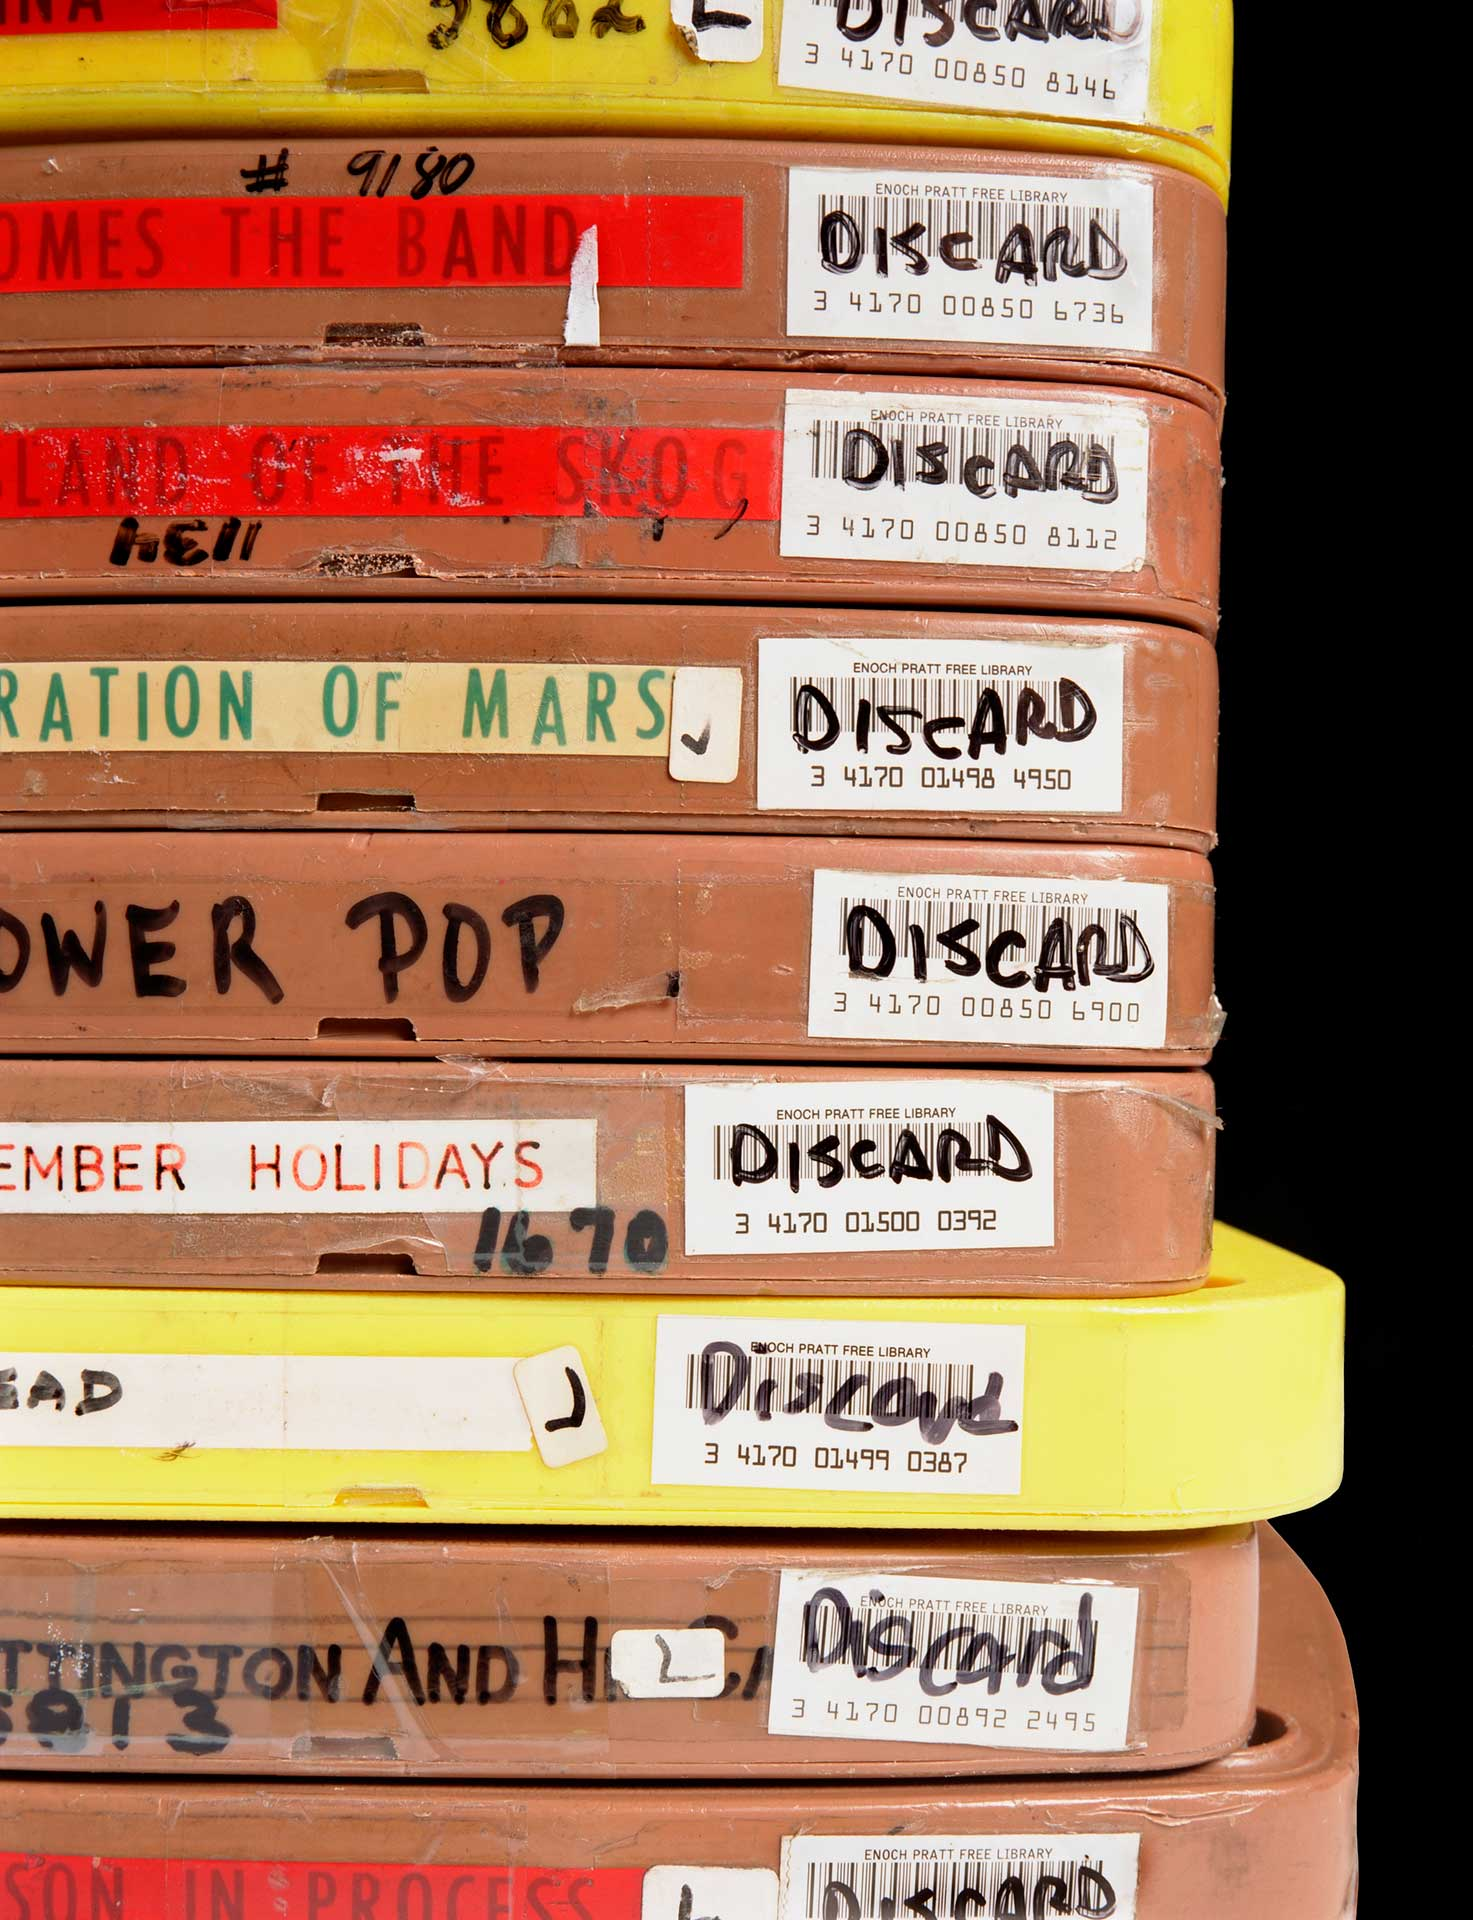 Discards (Enoch Pratt Library, Baltimore, MD)